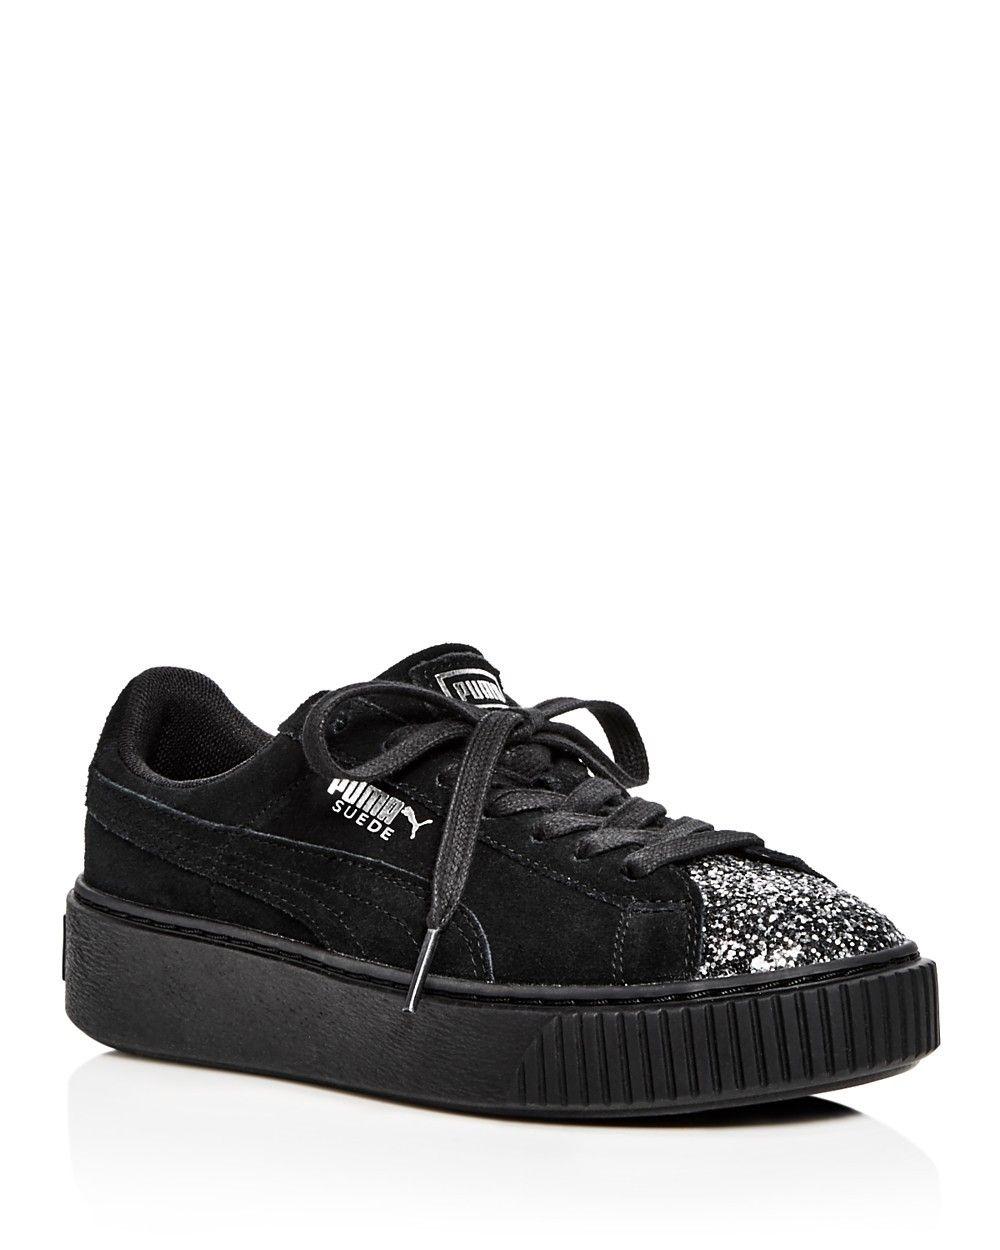 46ac93929785 PUMA PUMA Women s Crushed Gem Suede Lace Up Platform Sneakers.  puma  shoes